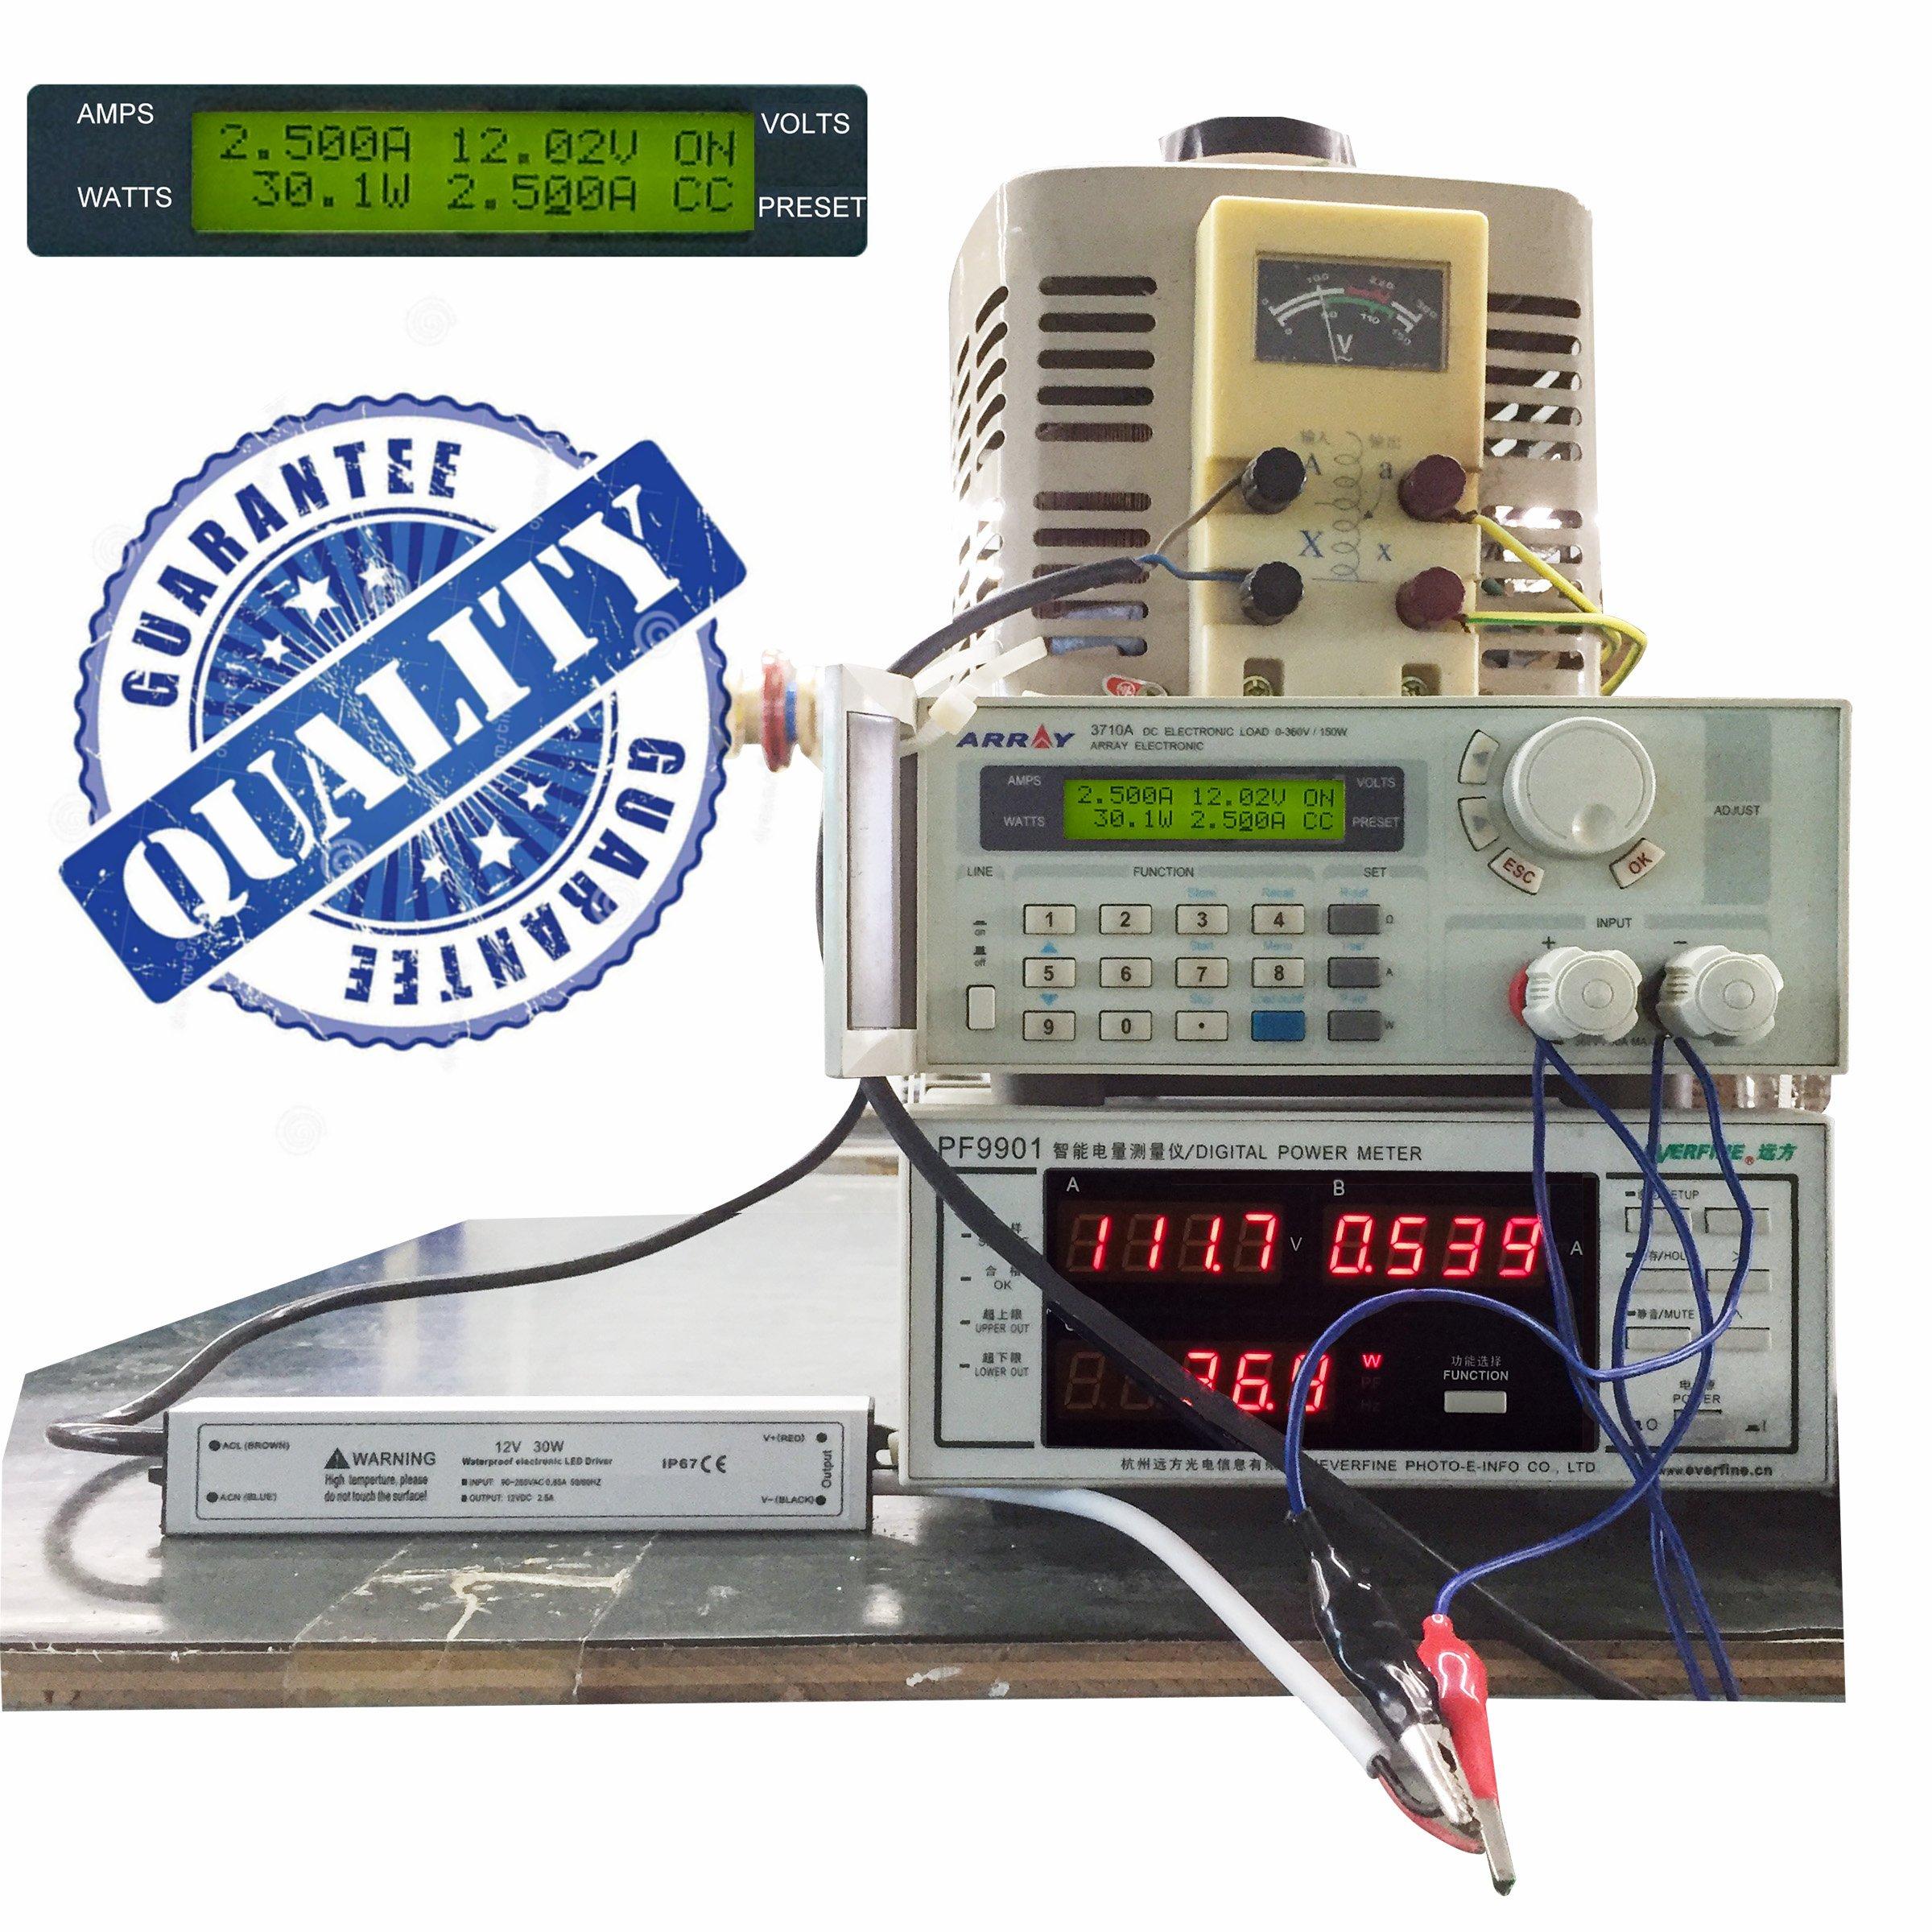 Aluminum Alloy Housing IP67 PLUSPOE Waterproof 12 volt 60 watt LED Power Supply Driver Transformer with 3-Prong Plug